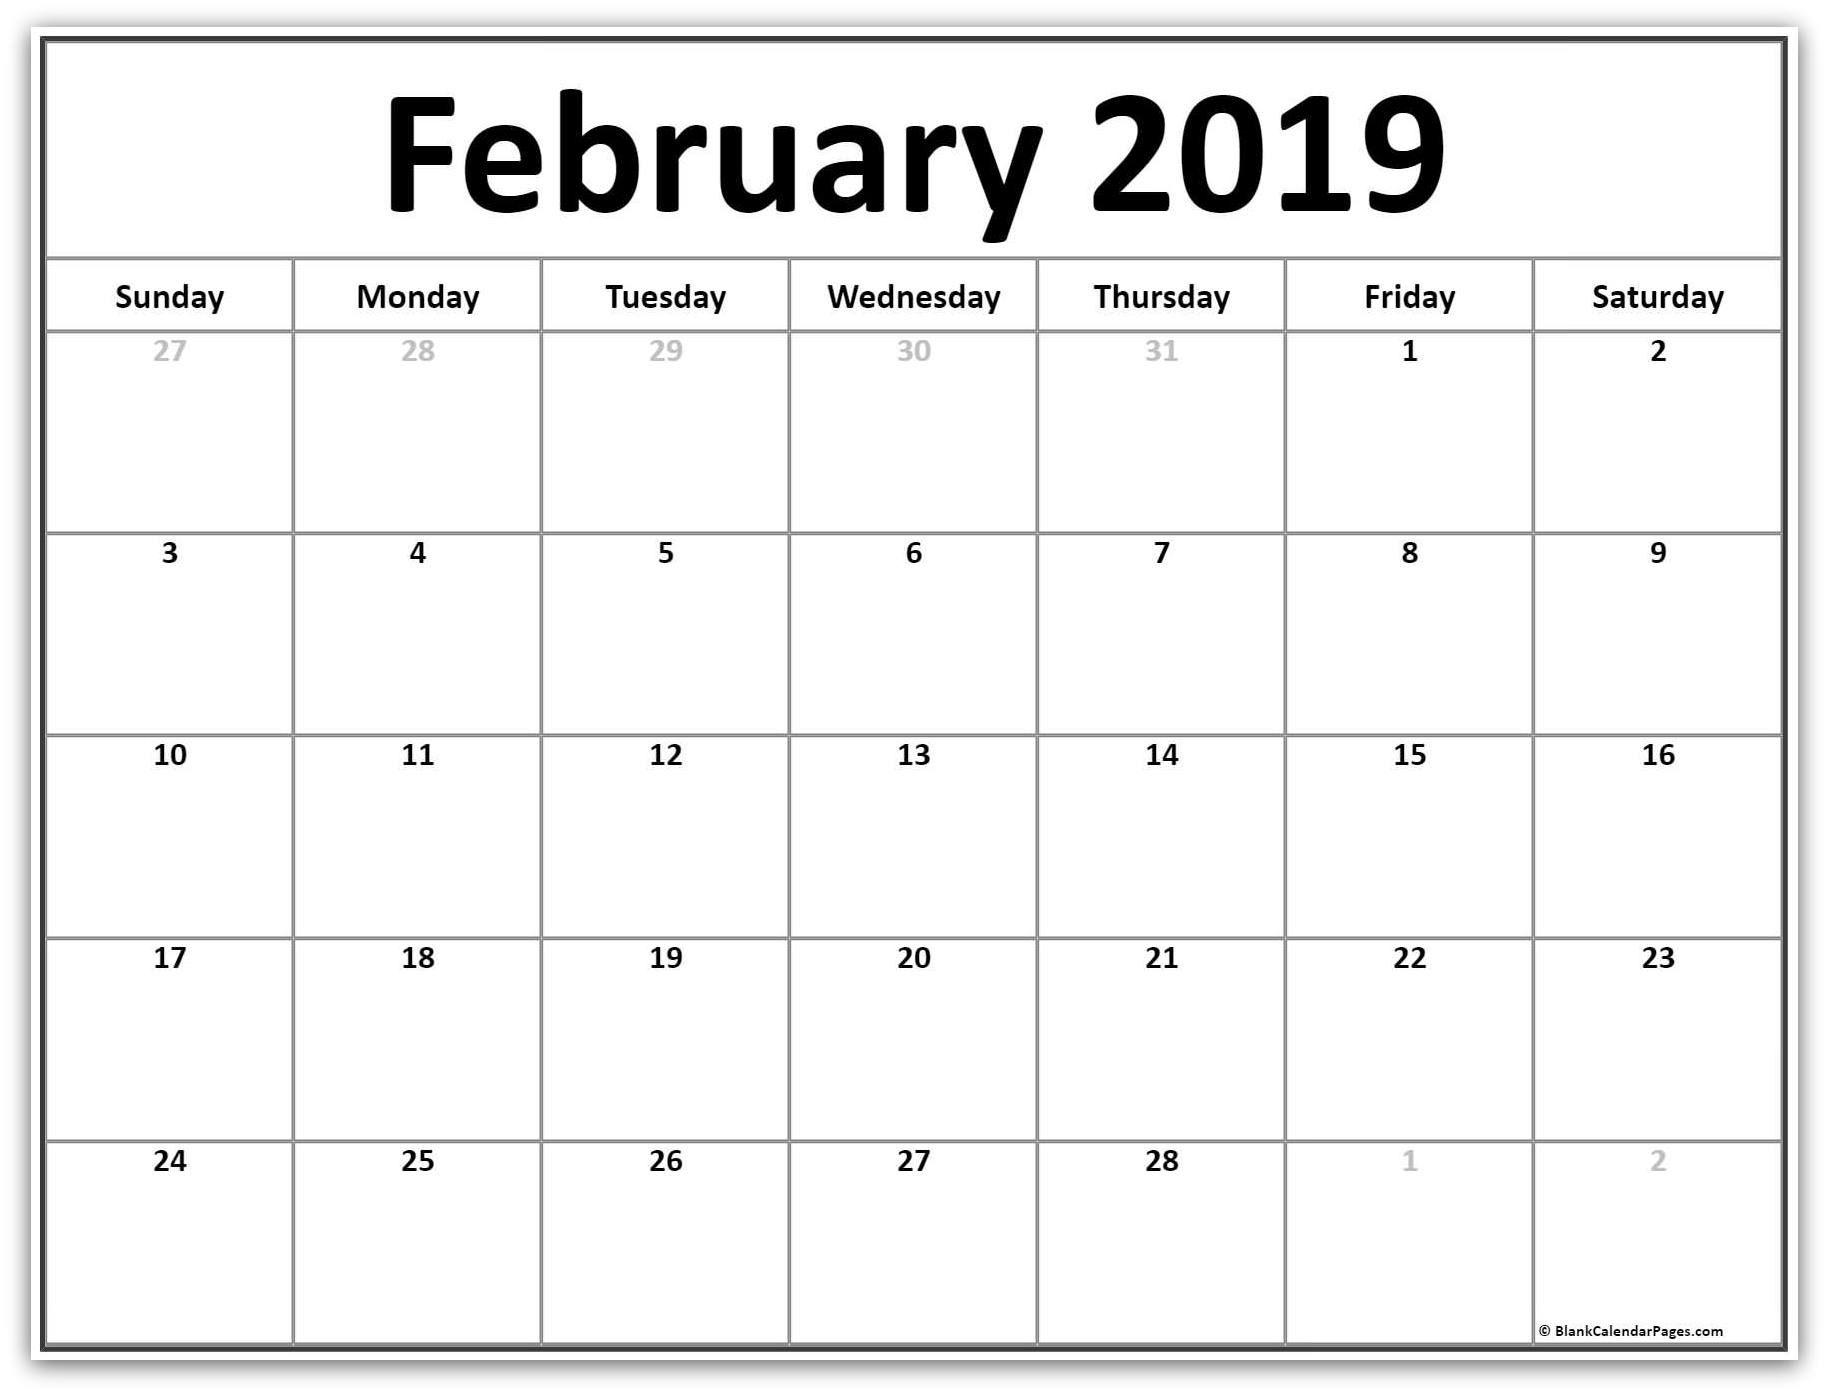 2019 Word Calendar For February blank february 2019 word calendar | 2019 Calendars | February